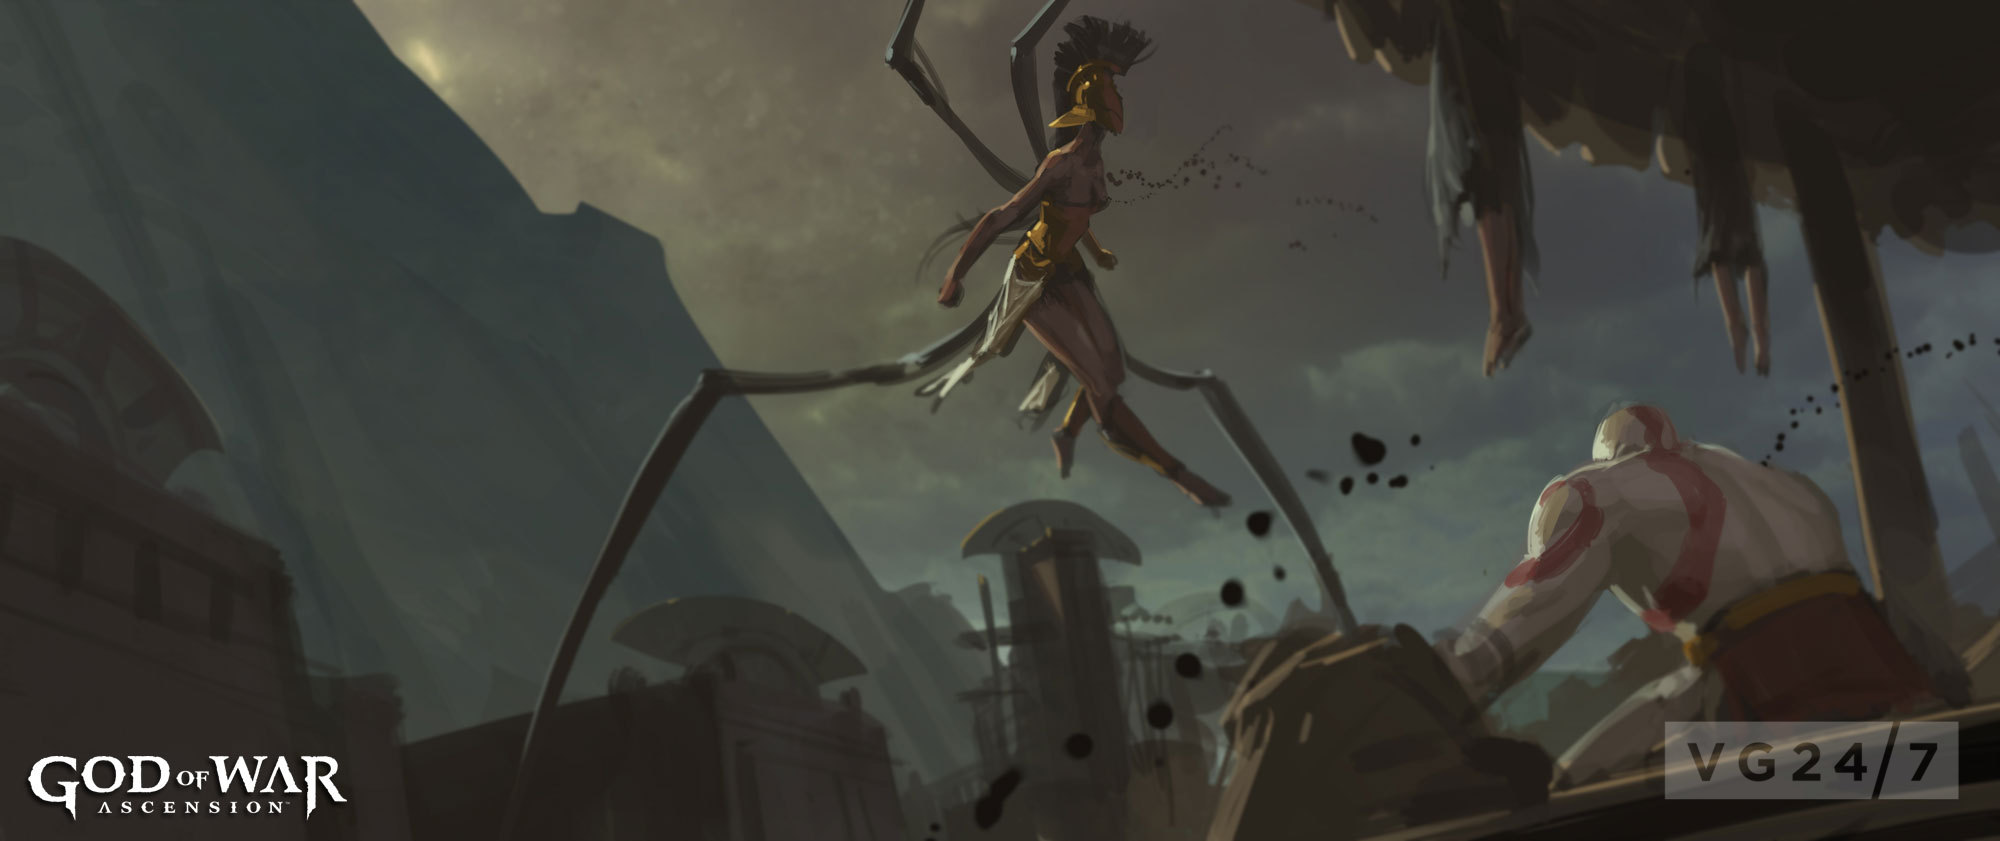 image megaerajpg god of war wiki fandom powered by